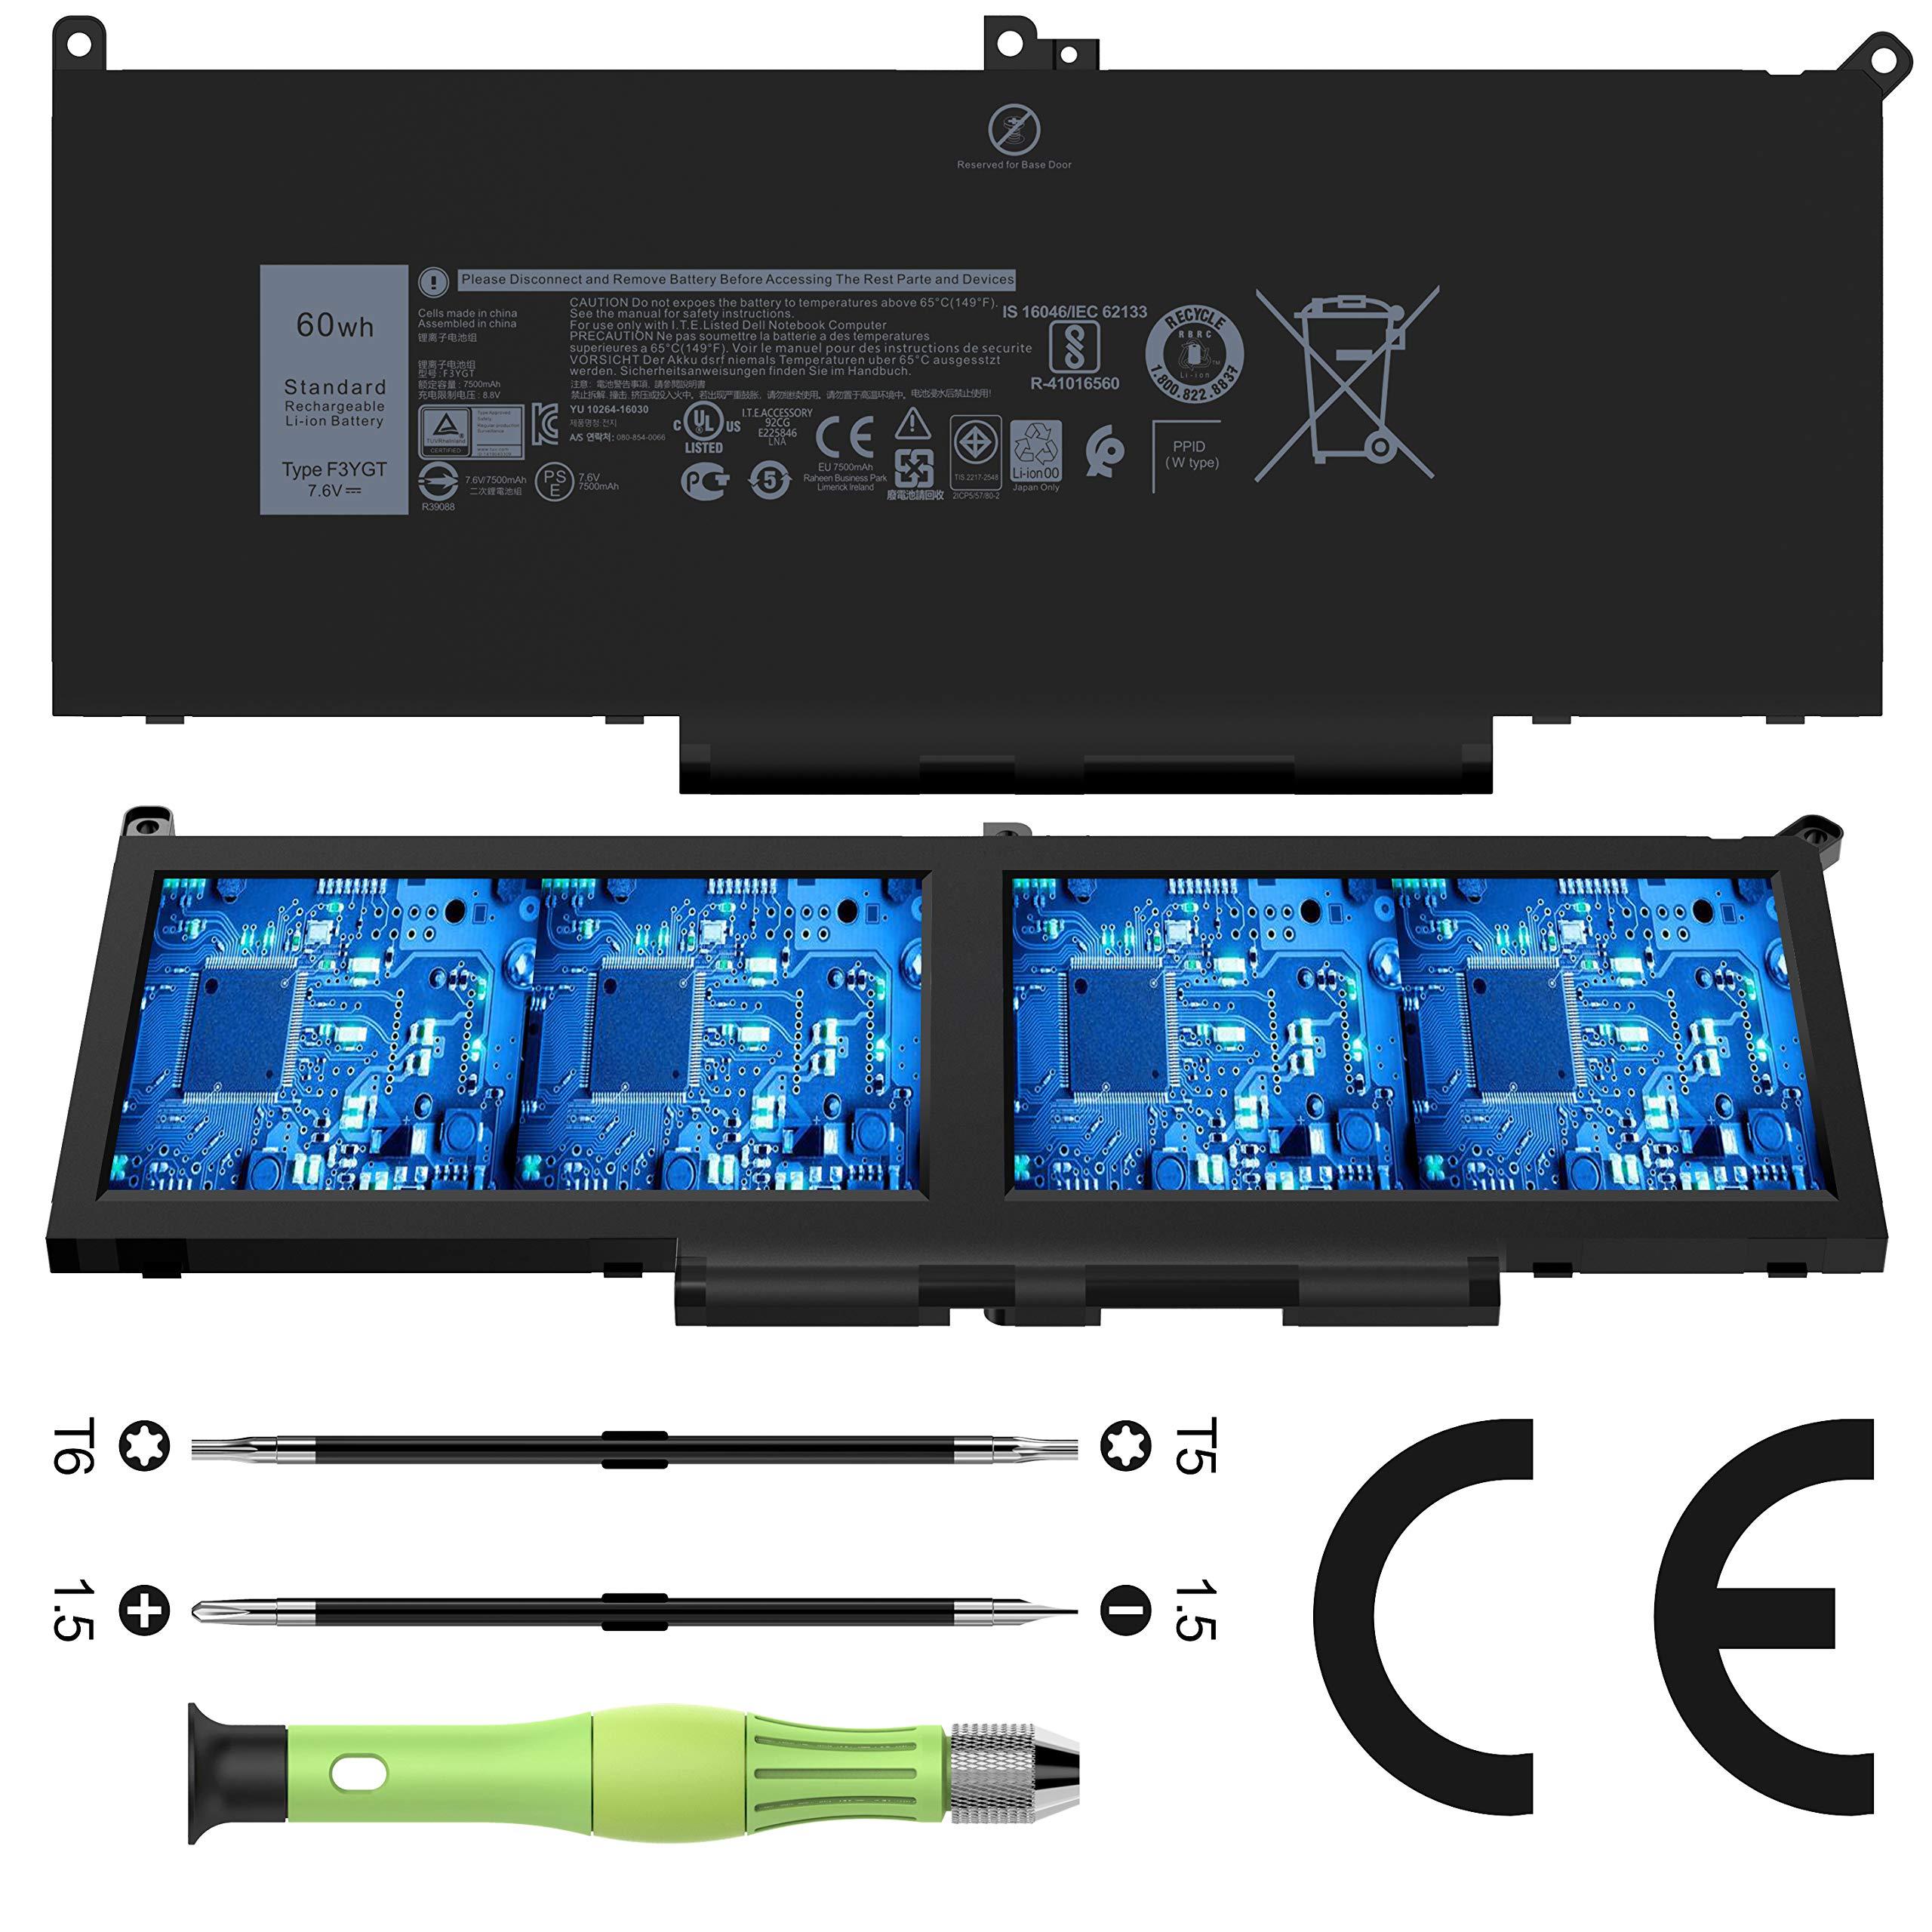 Bateria F3YGT Dell Latitude 12 7000 7280 7290 13 7000 7380 7